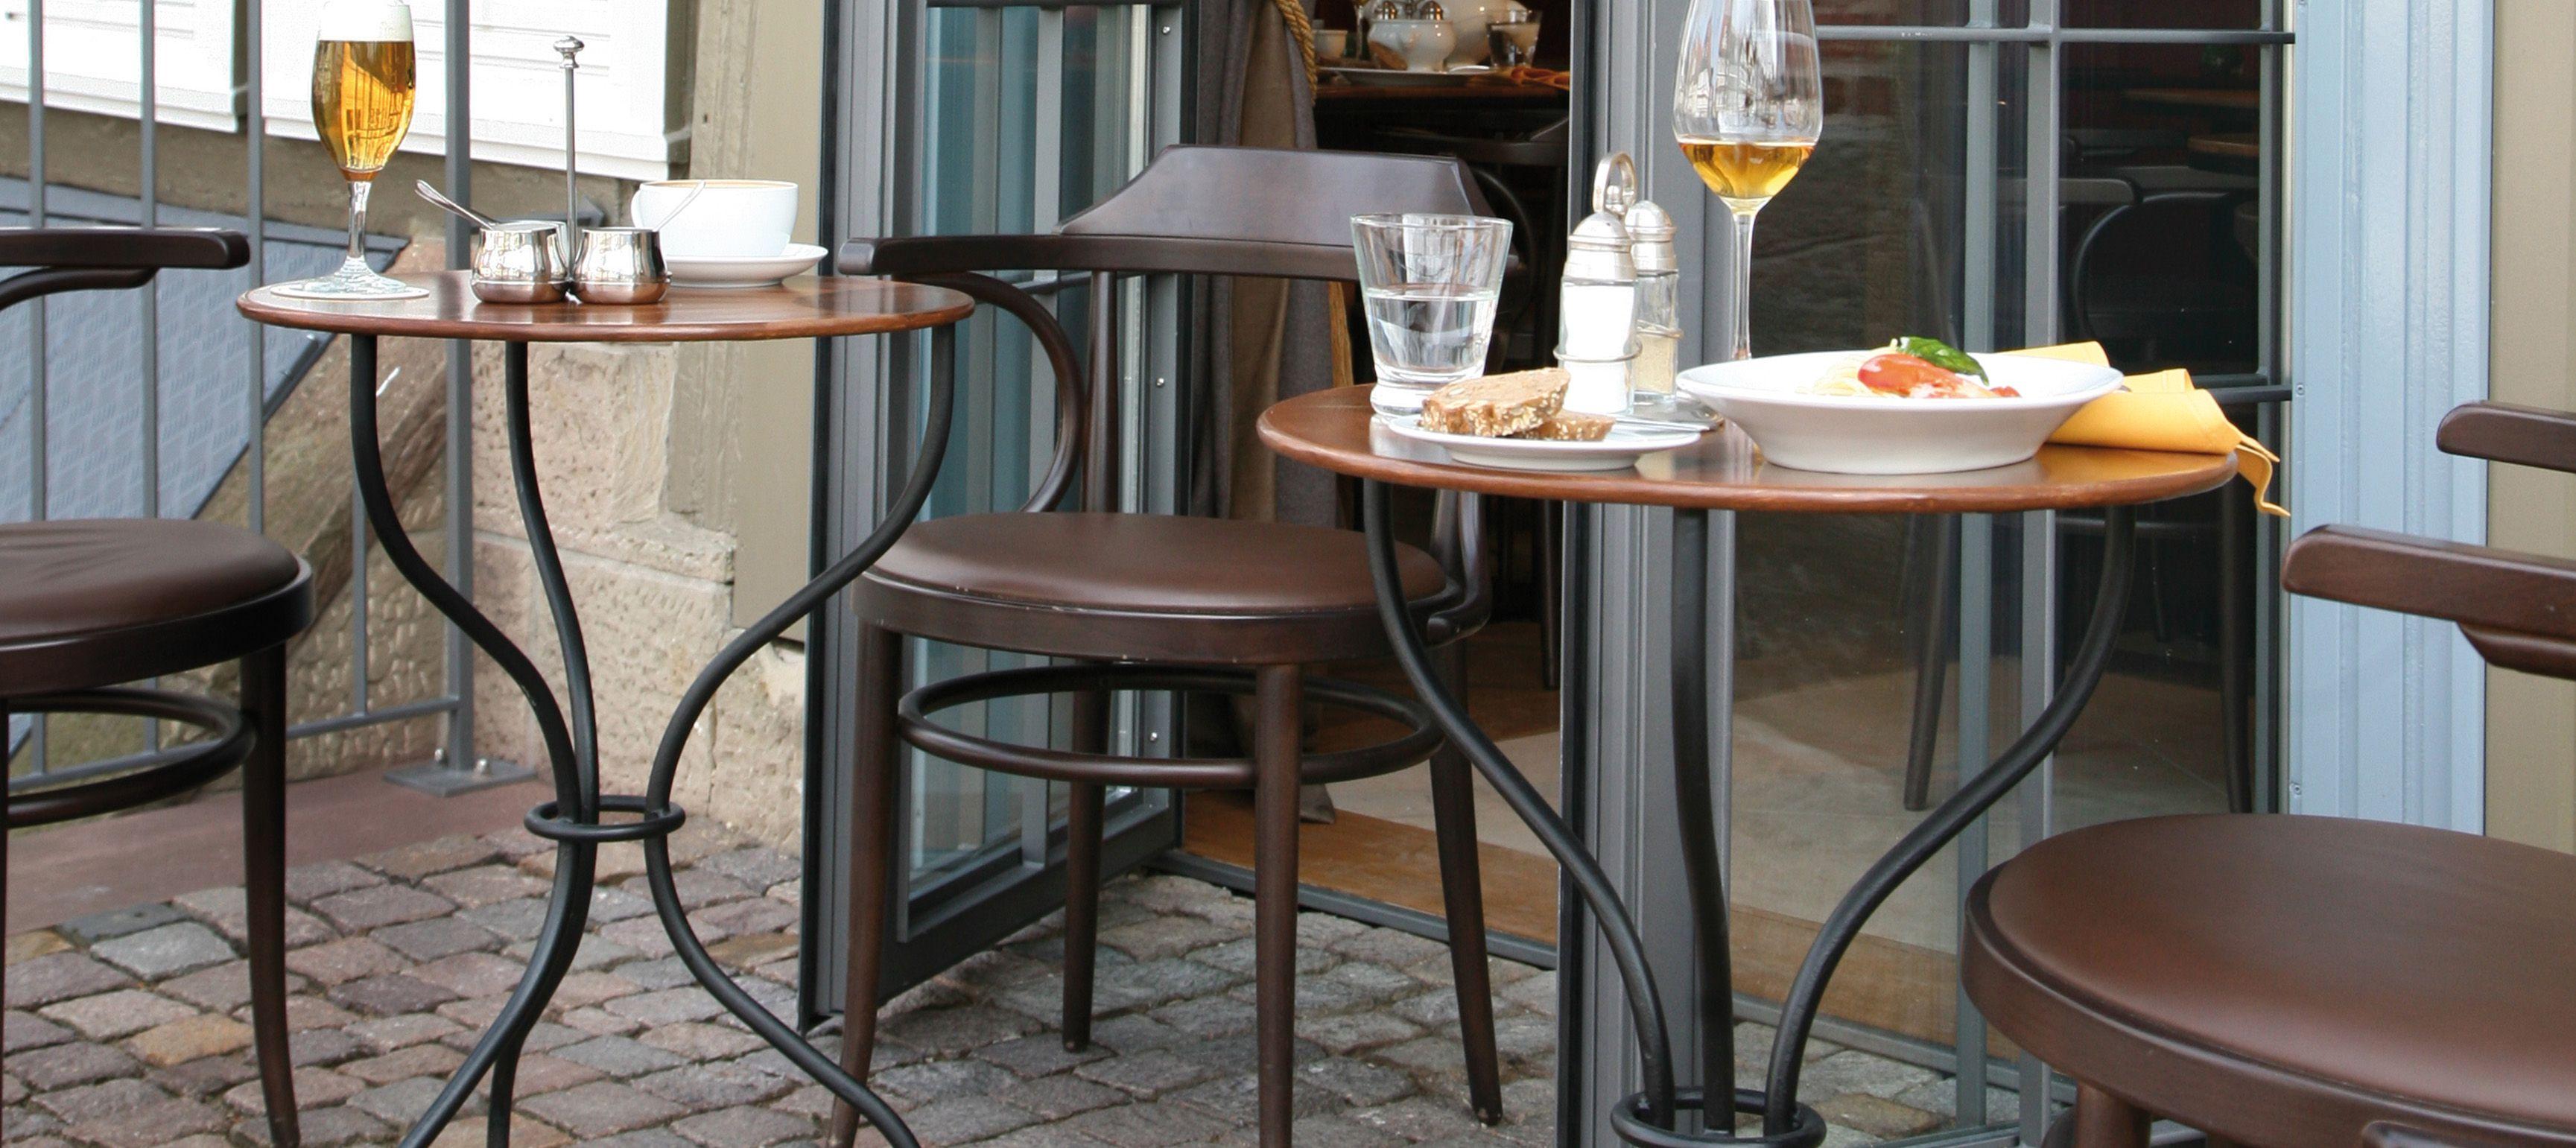 Chaise 233 By Thonet Design Chaises Bois Table Bar Chaise